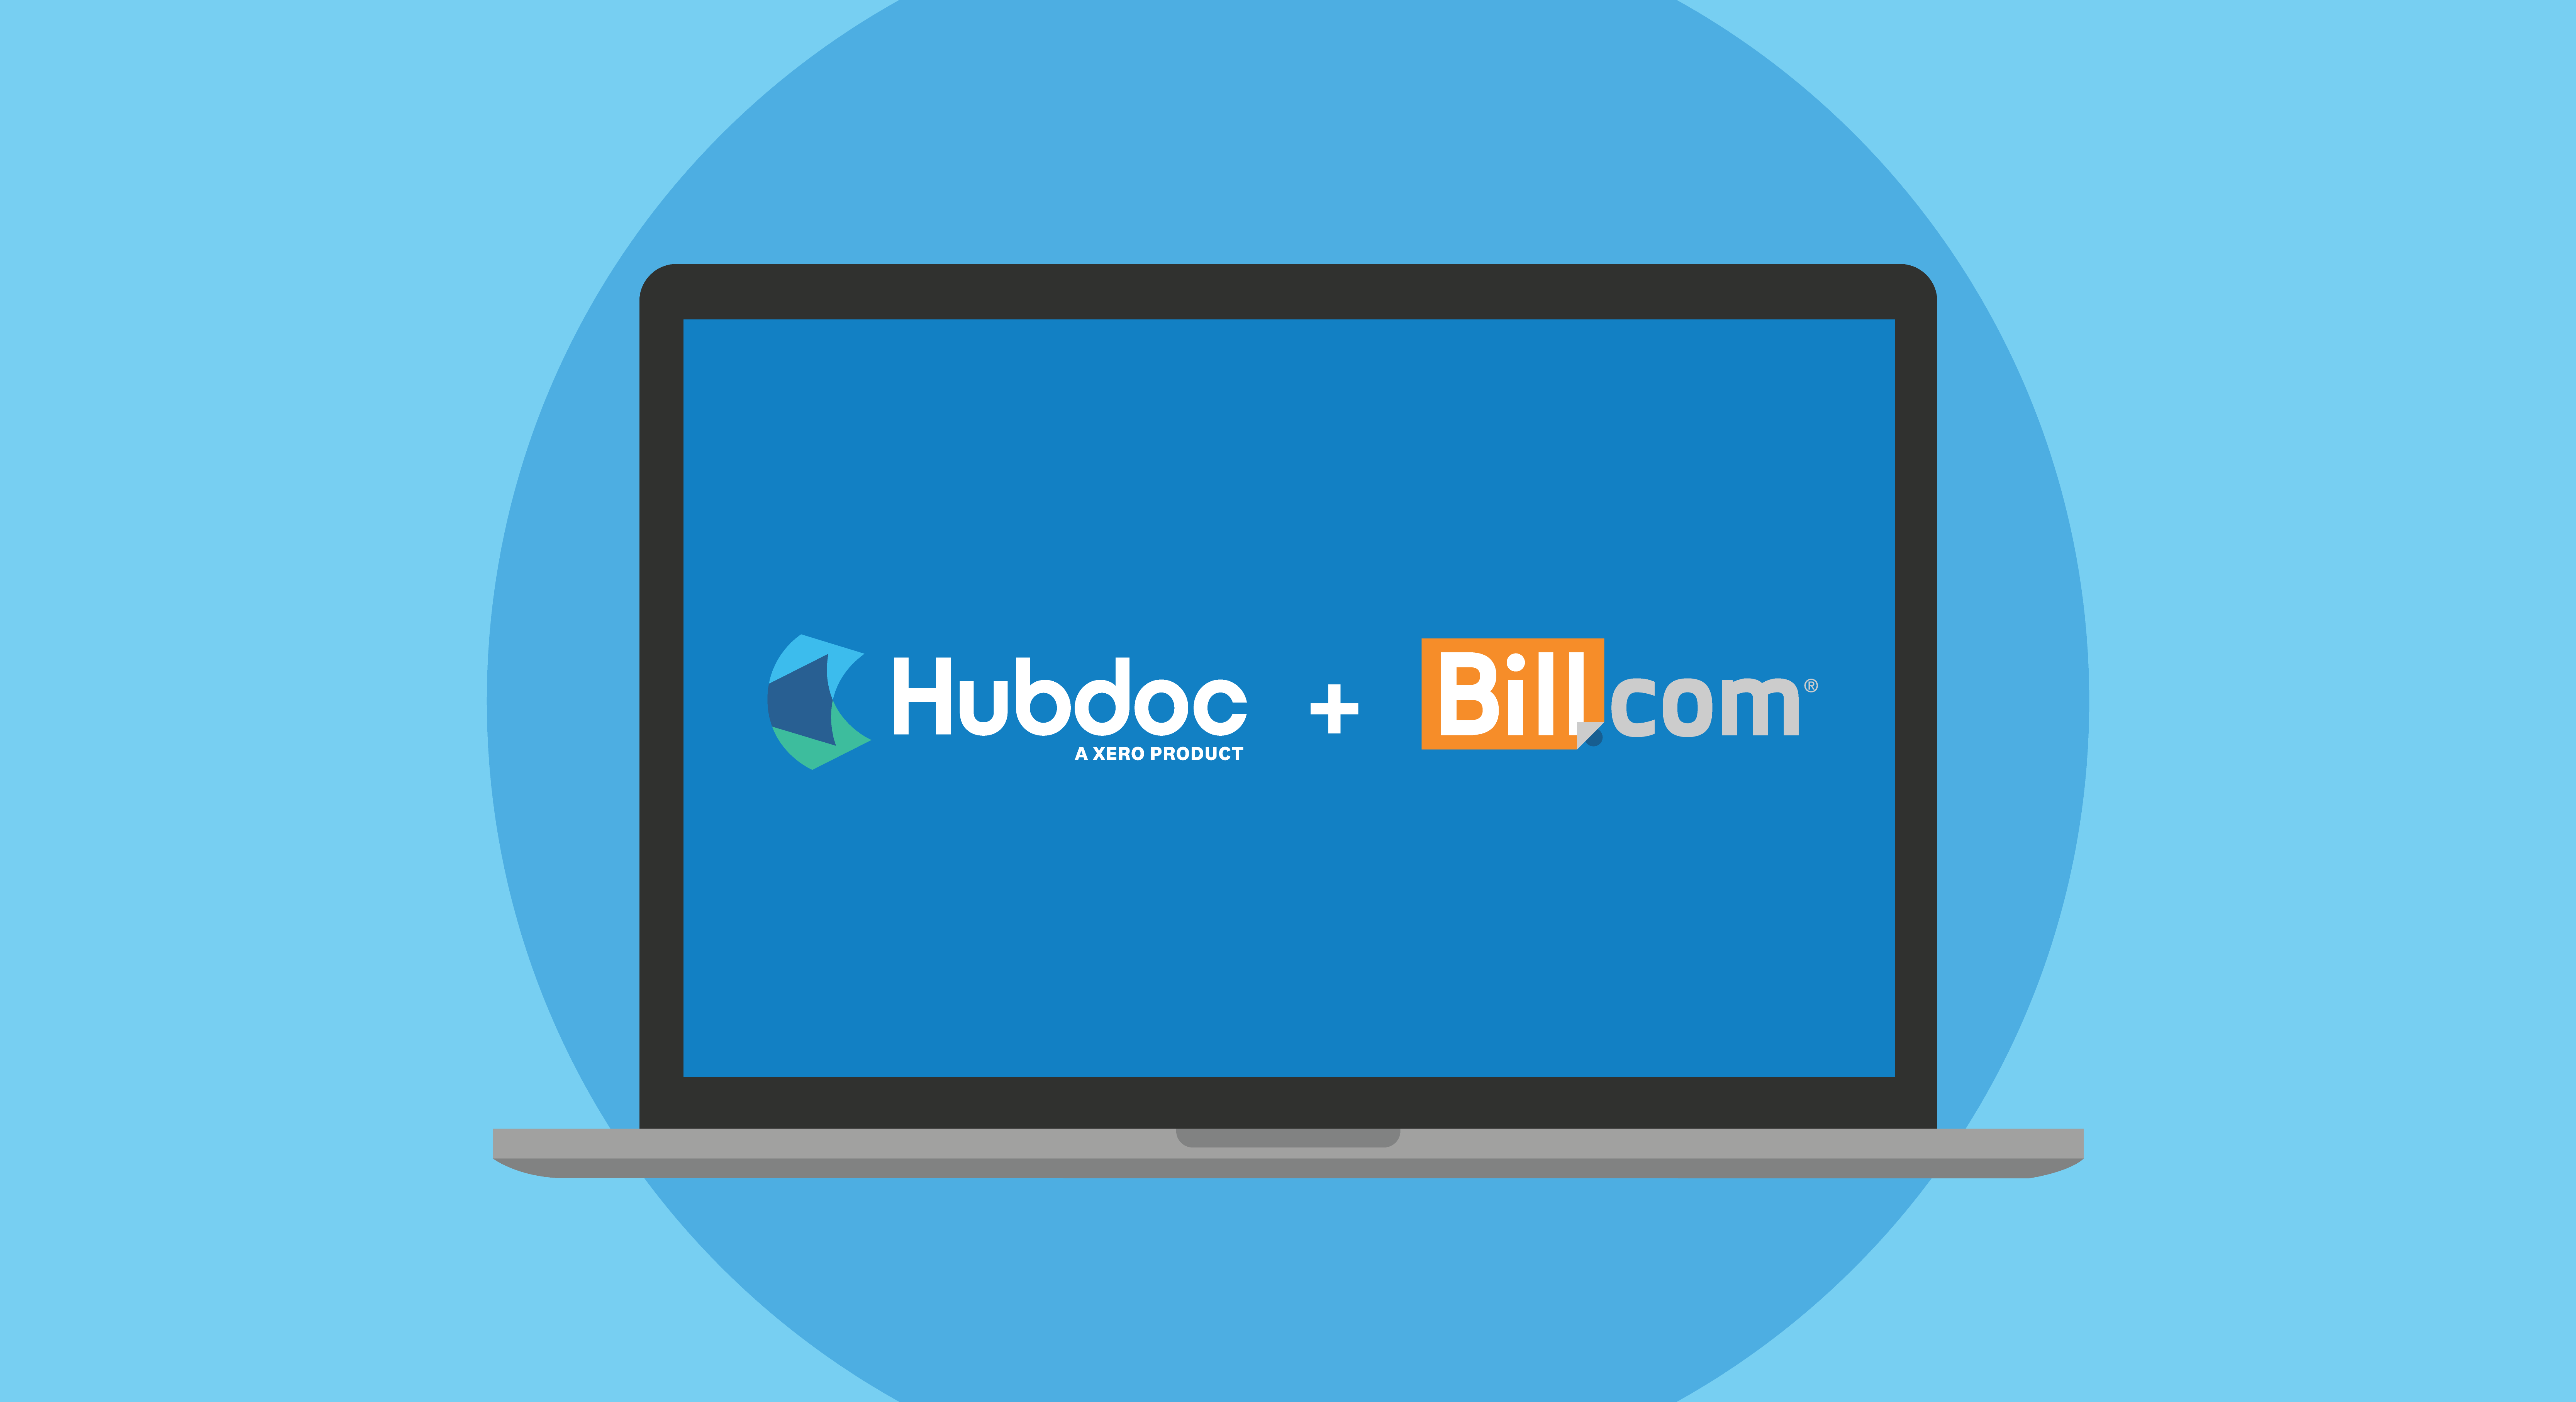 Hubdoc + Bill.com